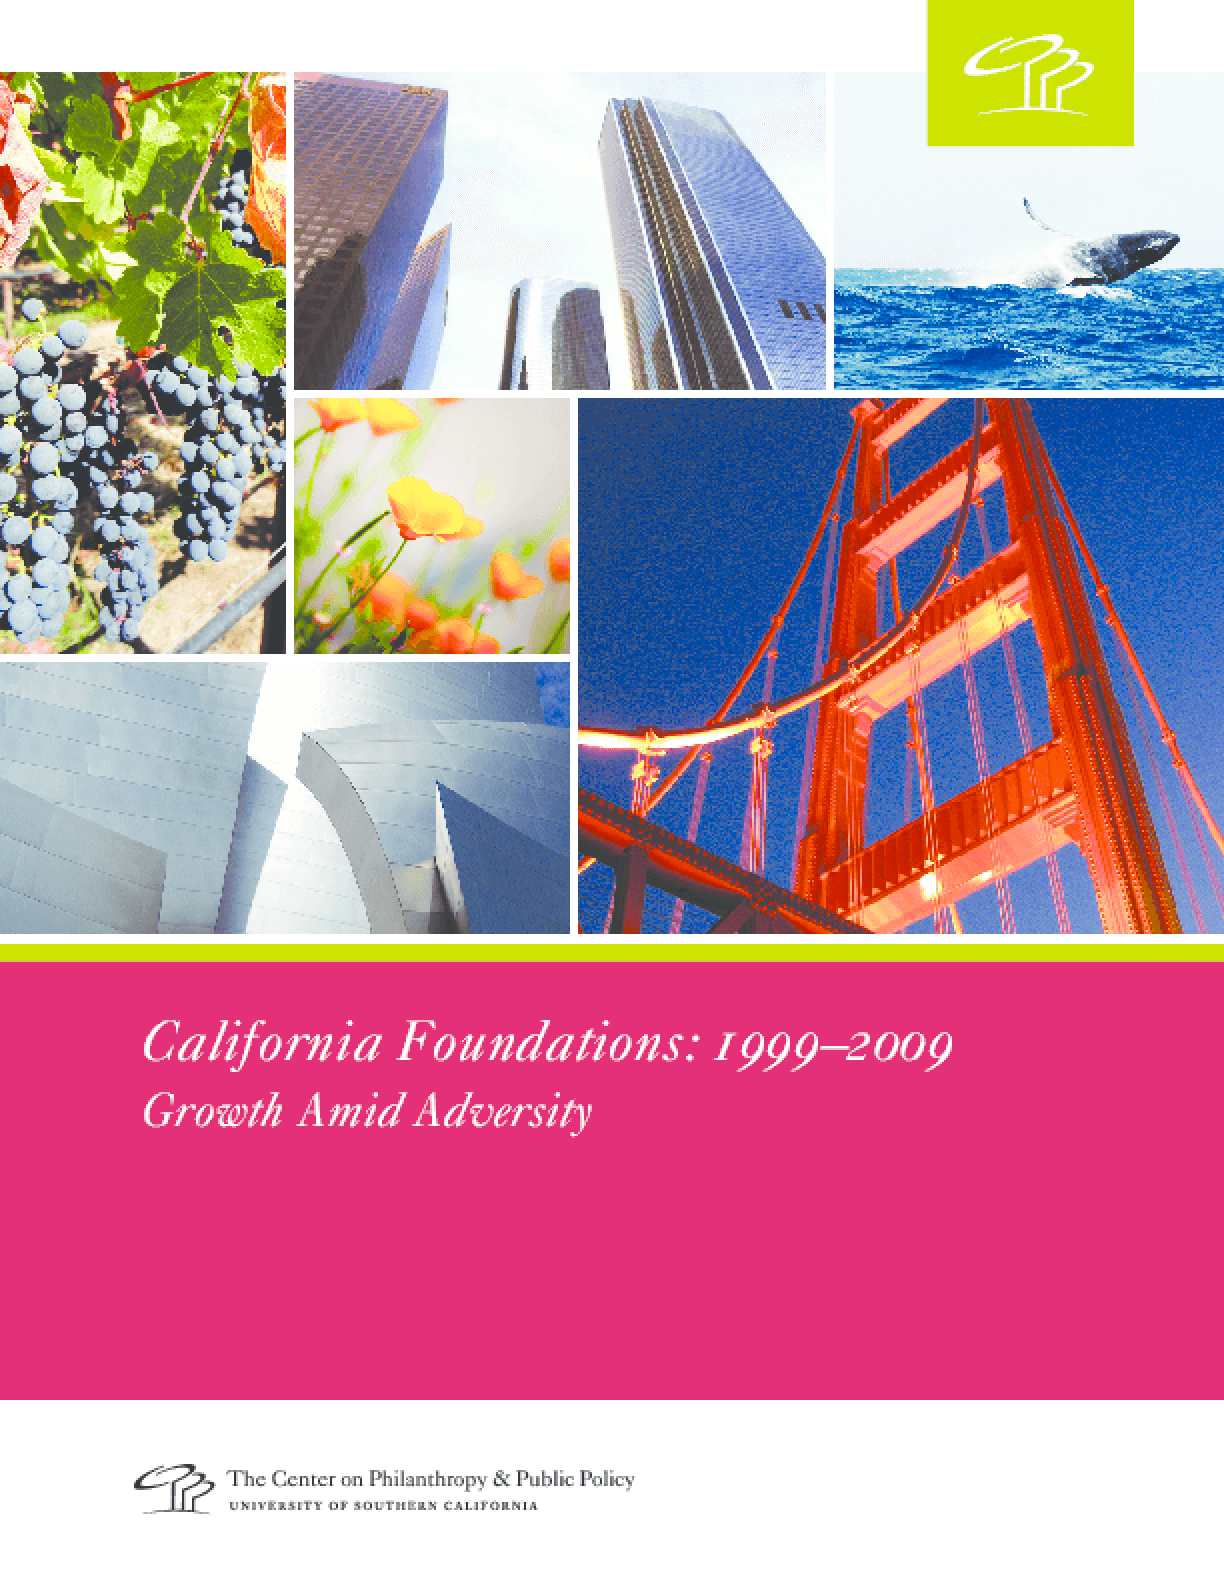 California Foundations: 1999-2009